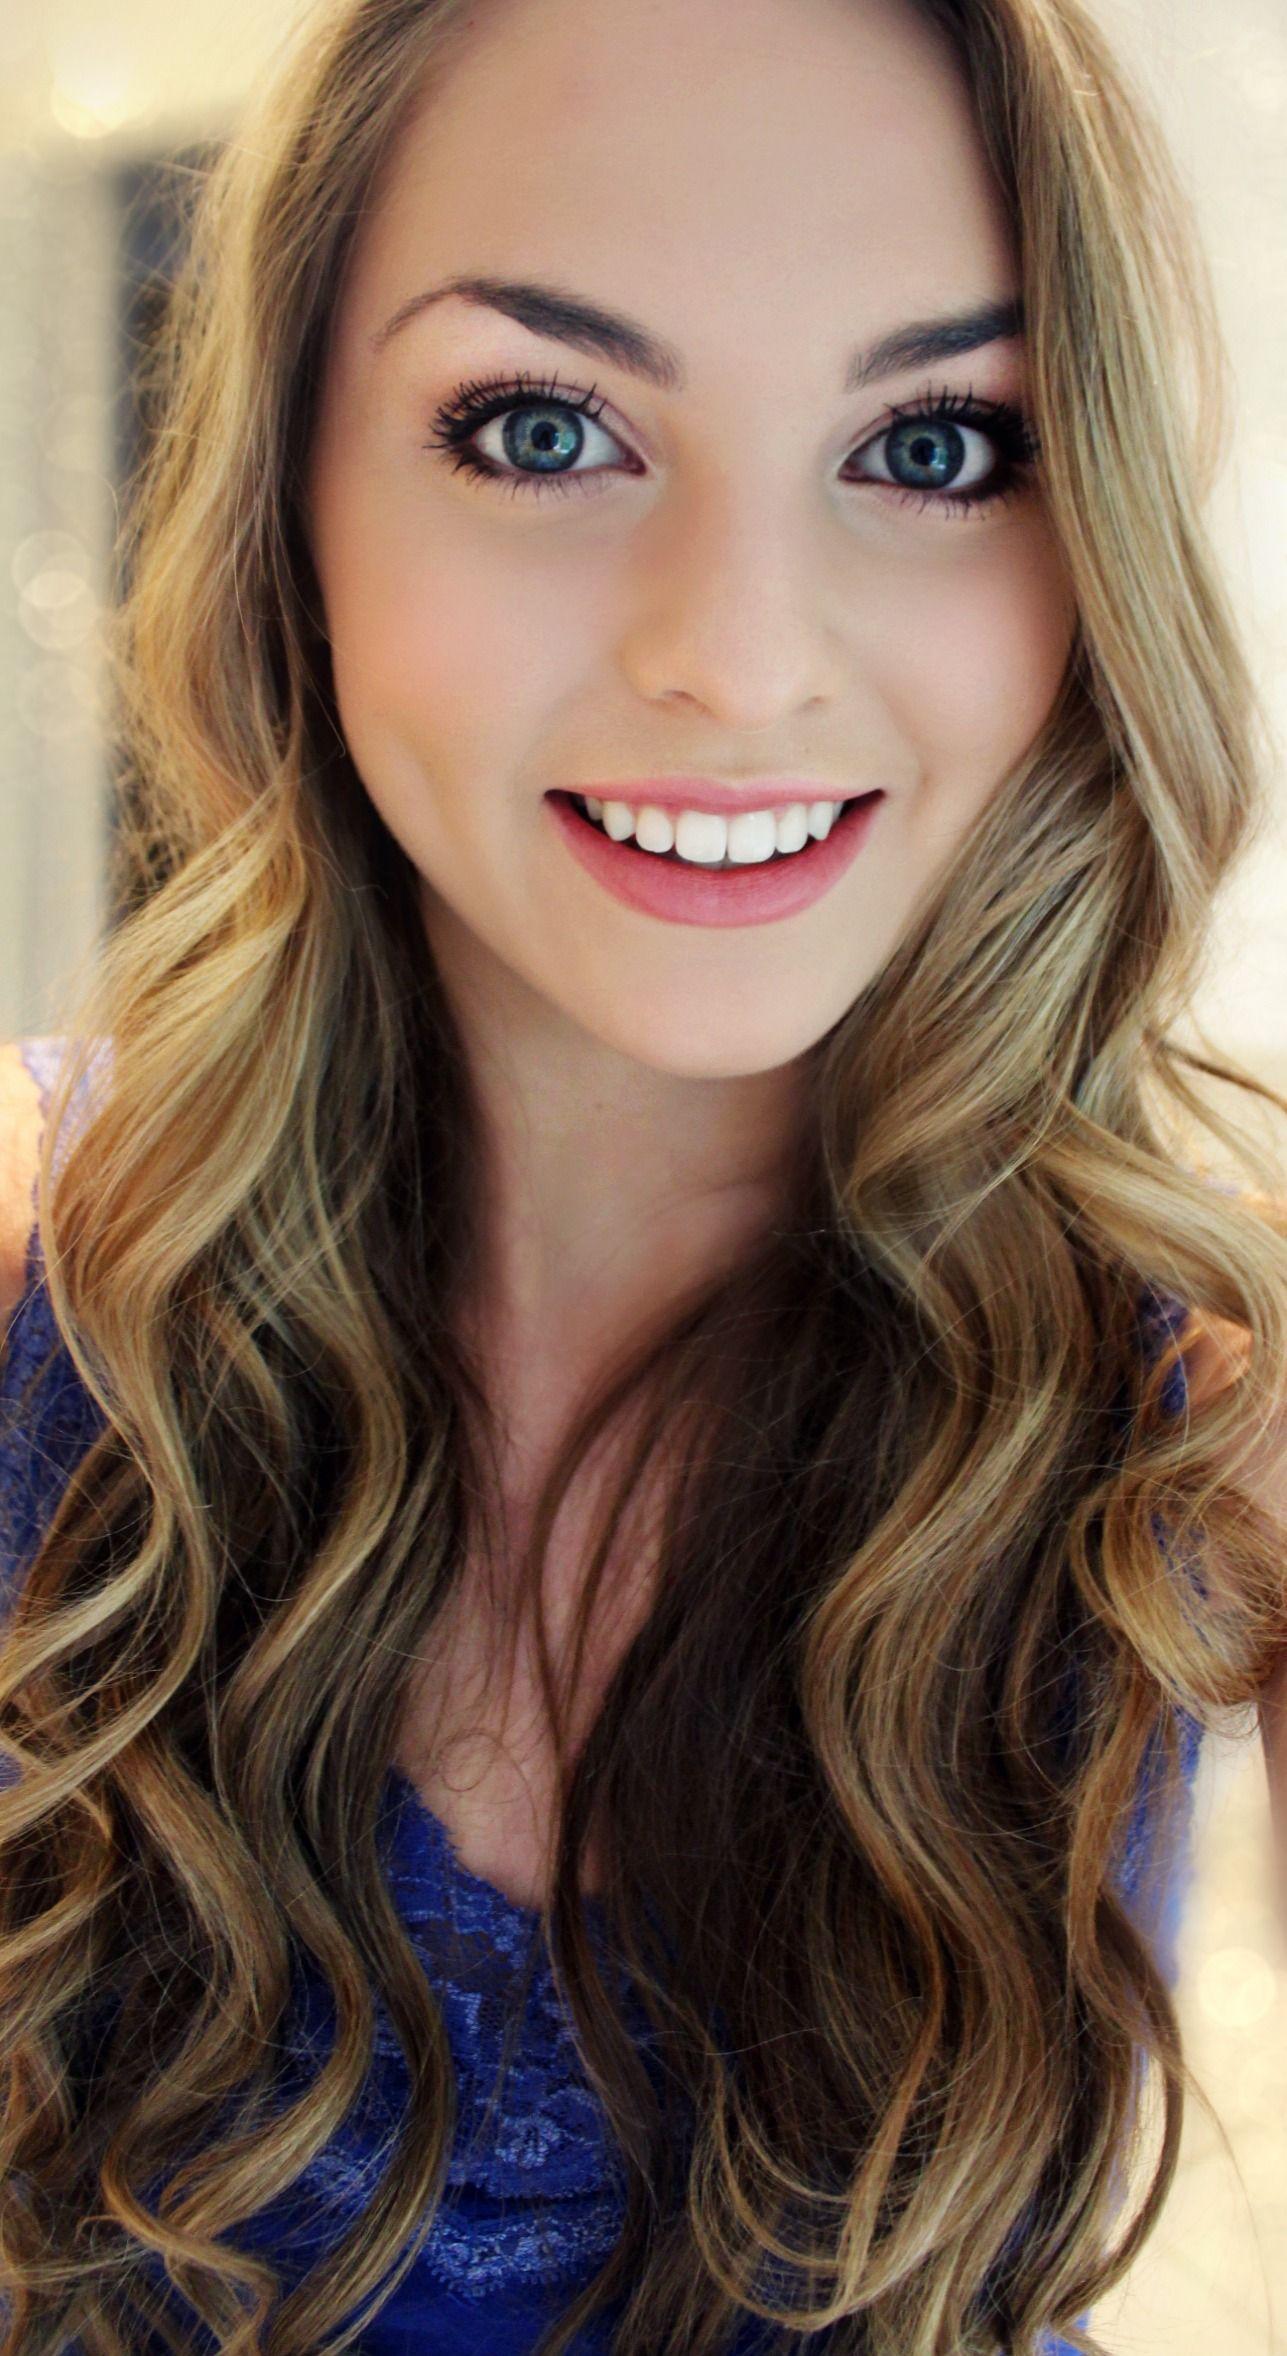 Idea by Melaninzekel on makeup Pinterest makeup, Makeup